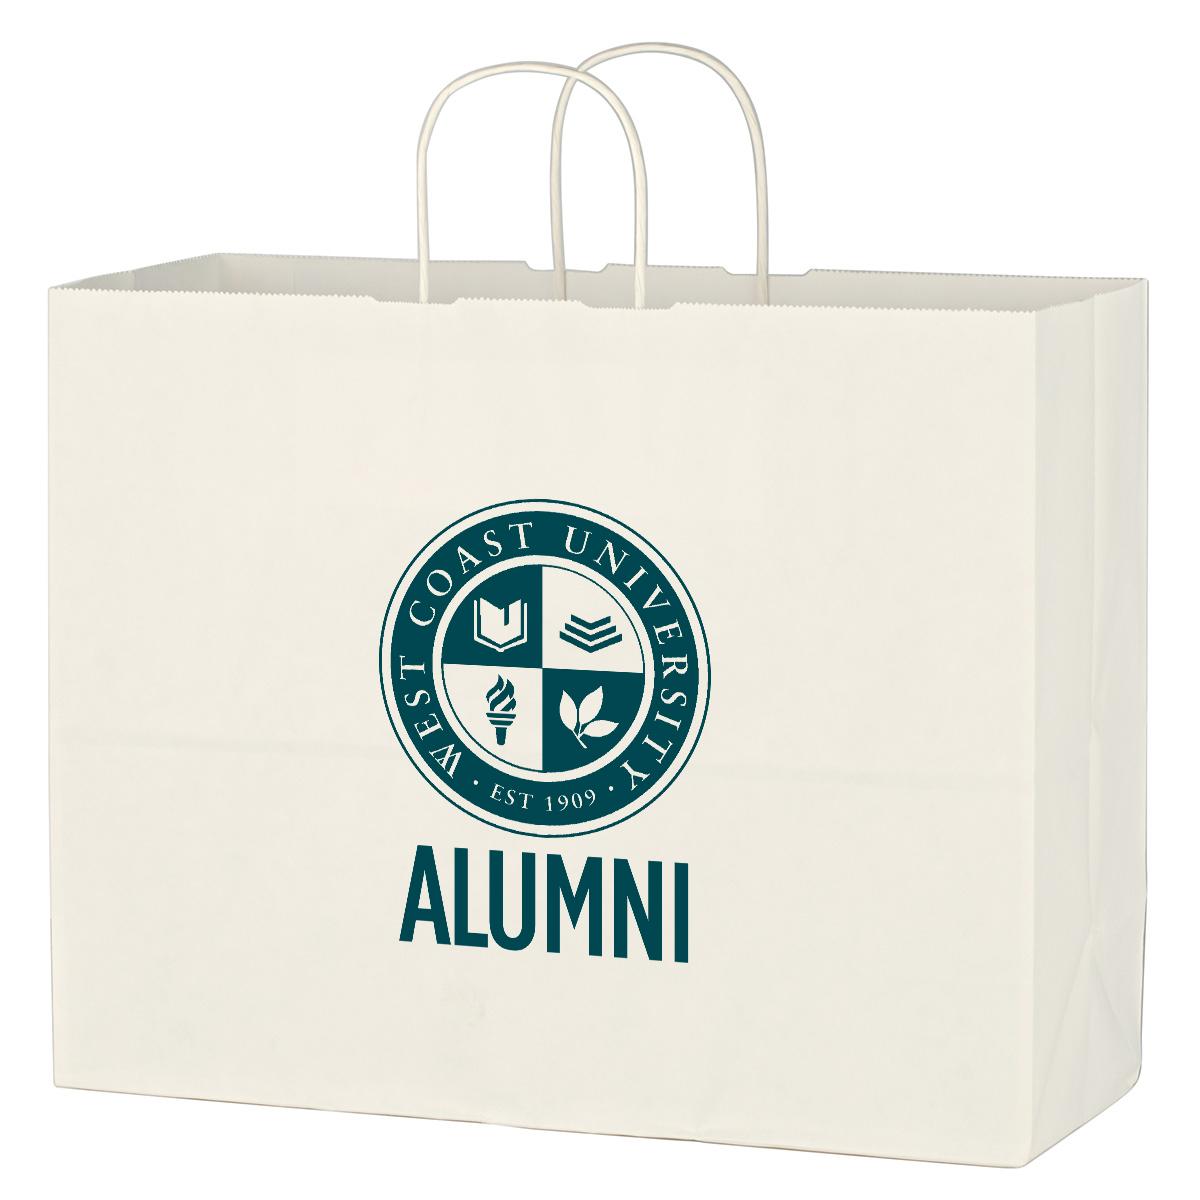 Kraft Paper White Shopping Bag - 16